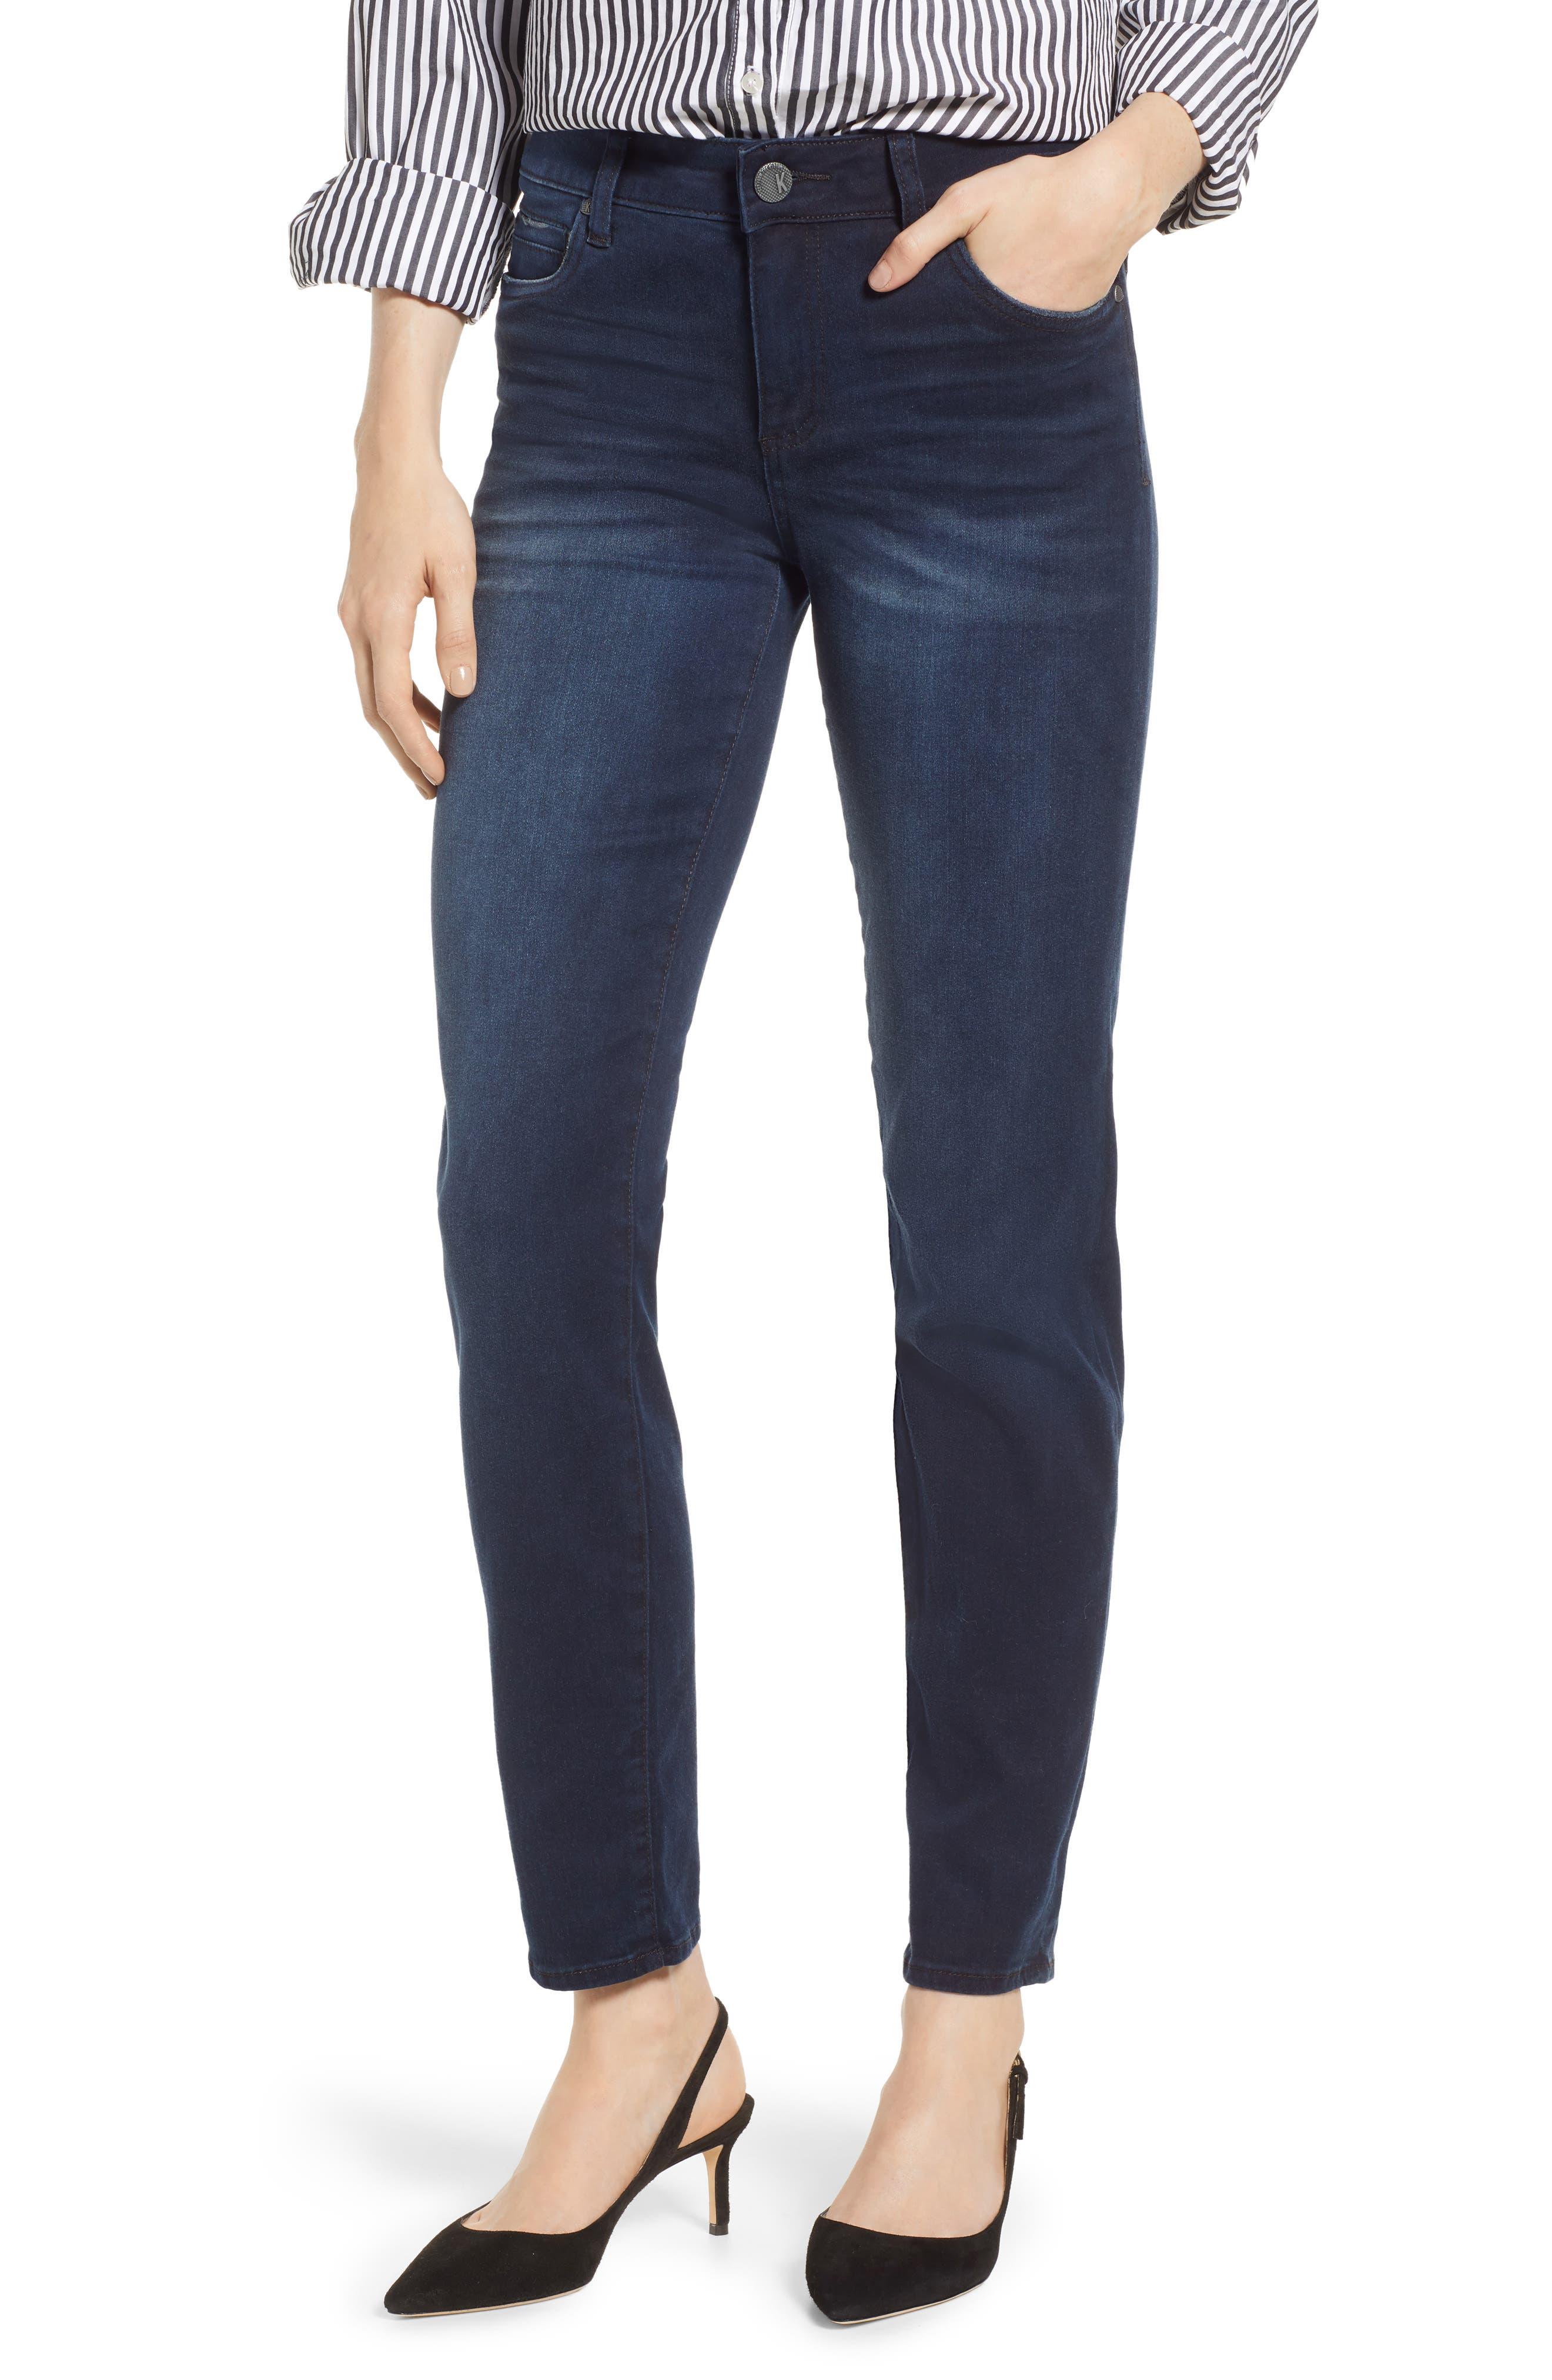 Diana Skinny Jeans,                             Main thumbnail 1, color,                             ART W/ EURO BASE WASH